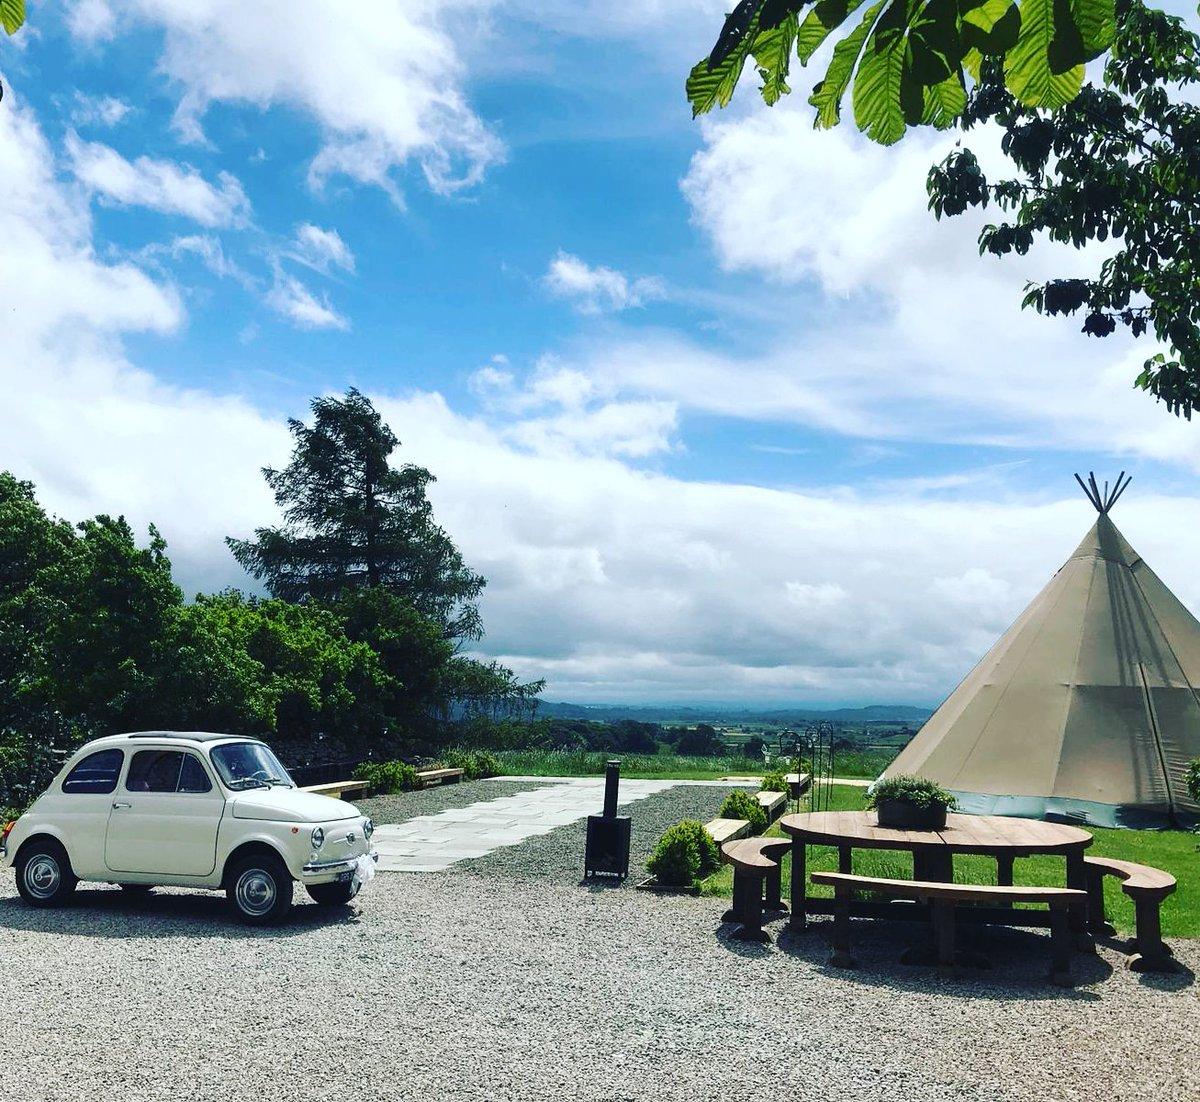 Stunning location for a wedding at Paddock Barn near Kendal #fiat500